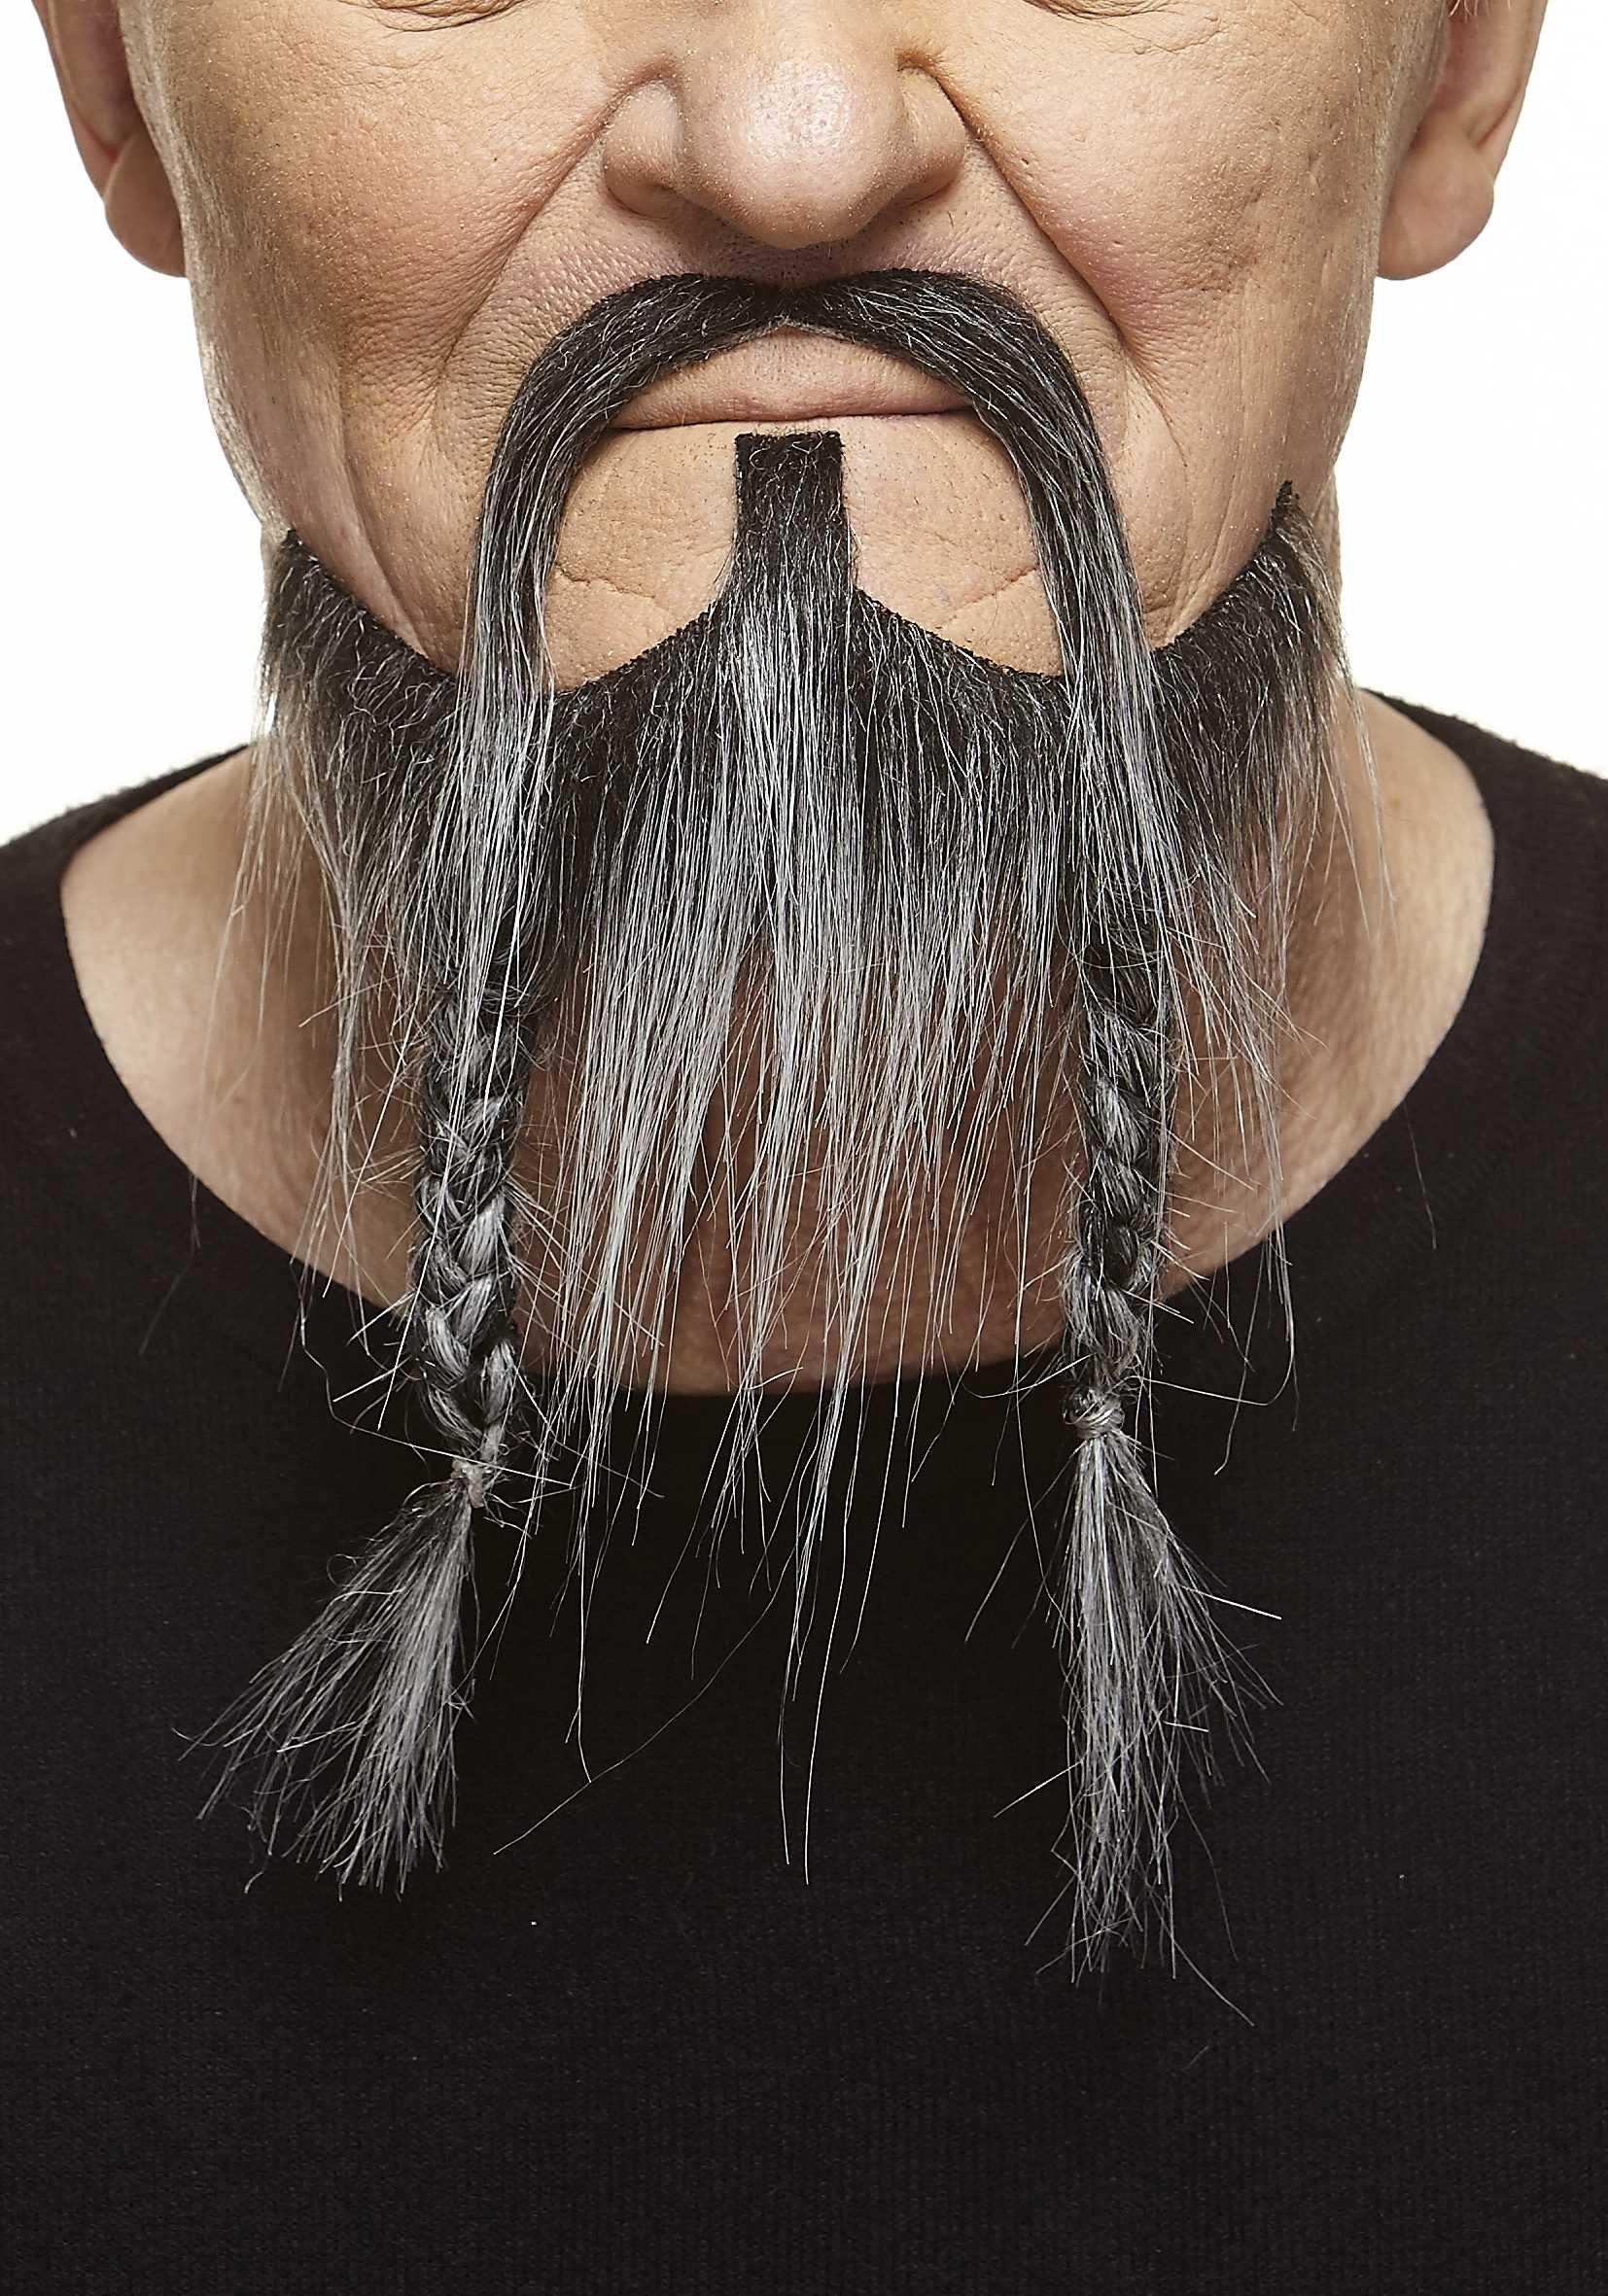 Mustaches Braided, Pirate Fake Beard, Salt and Pepper